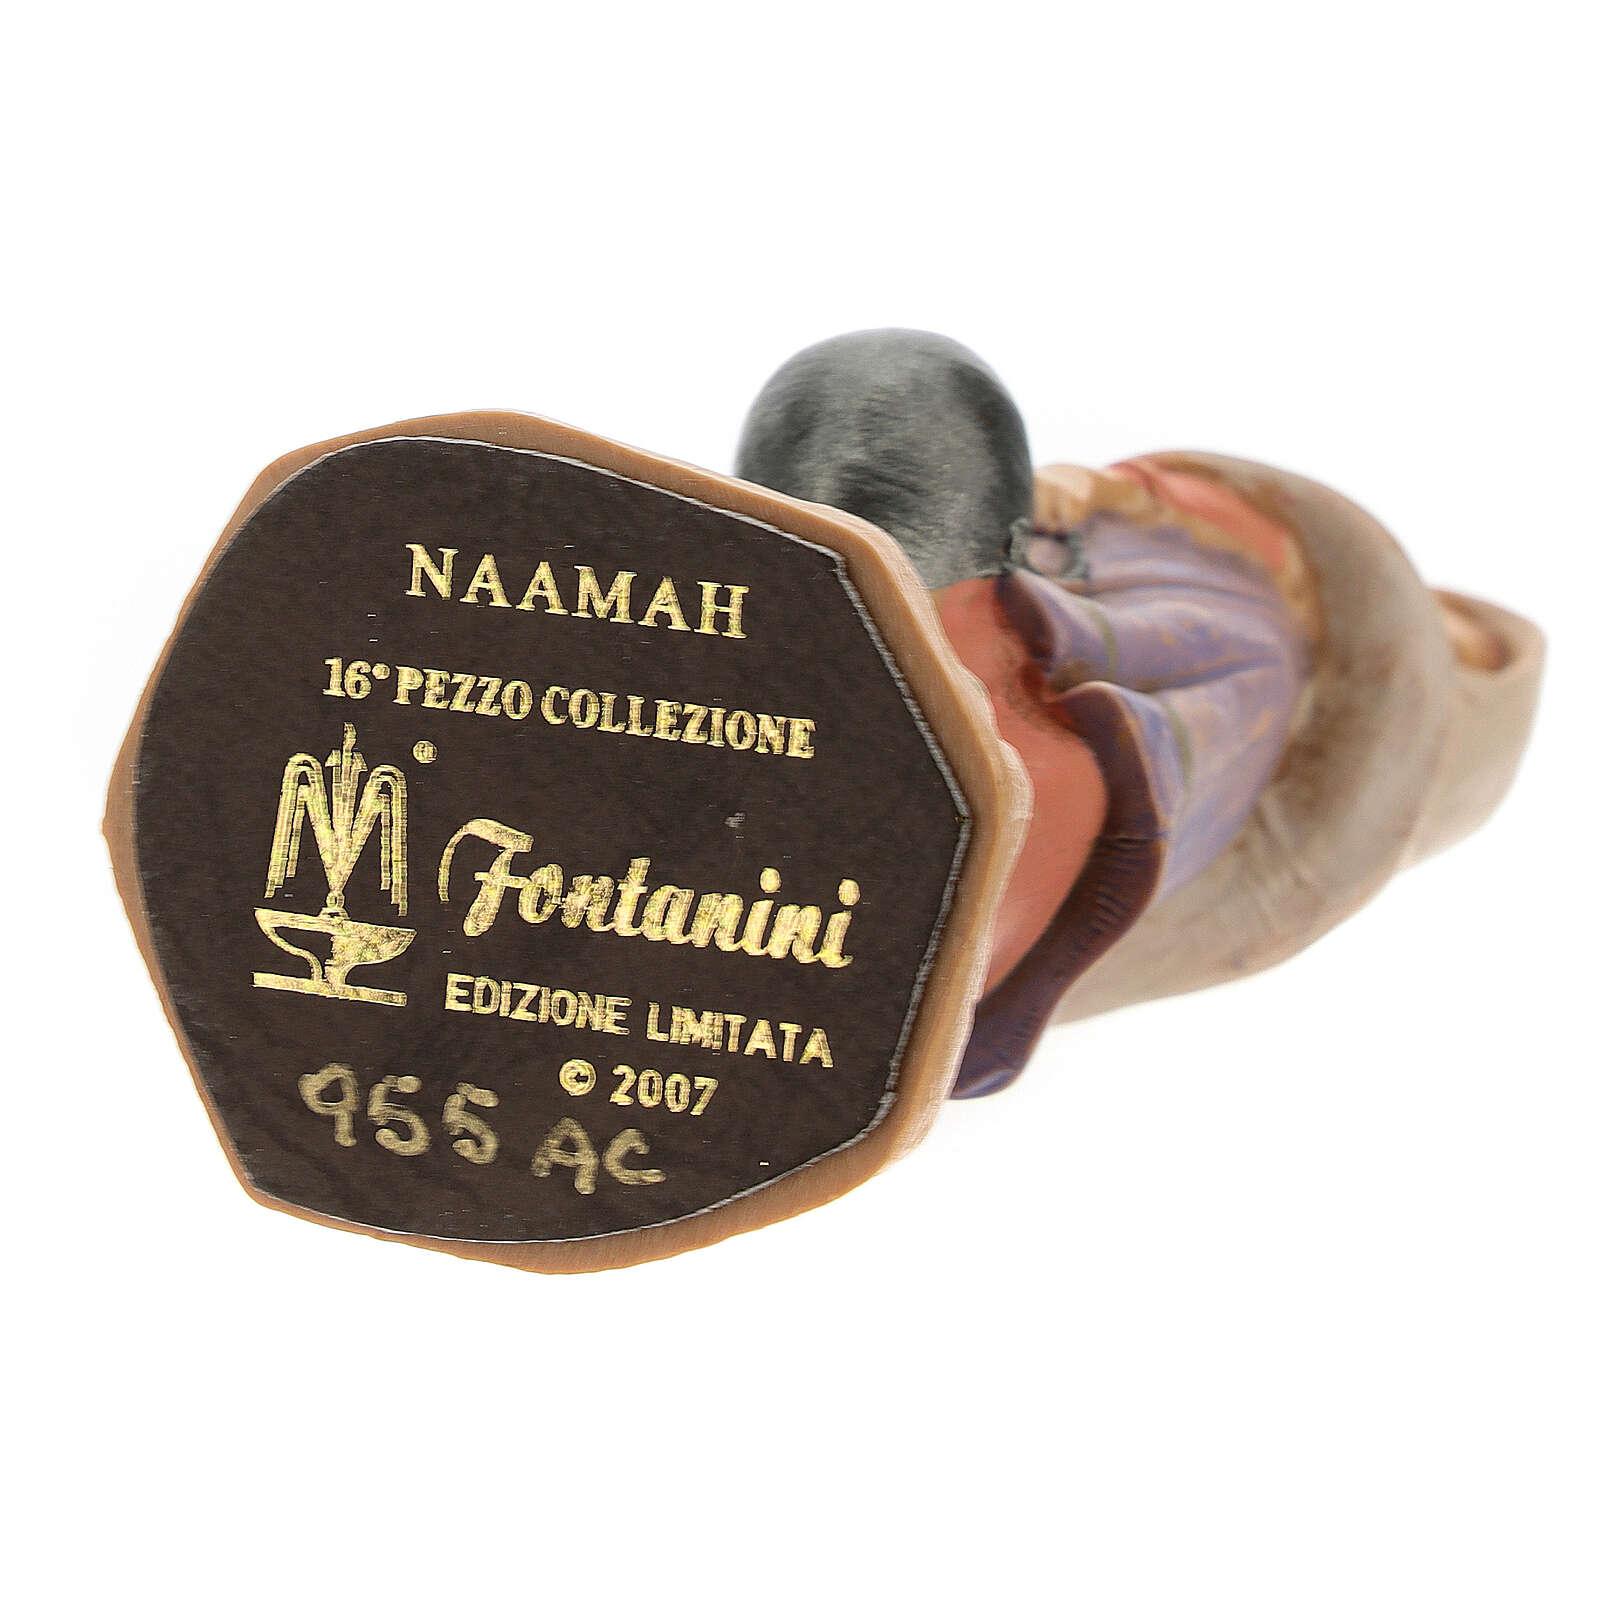 Naamah 12 cm Fontanini edición limitada año 2012 4